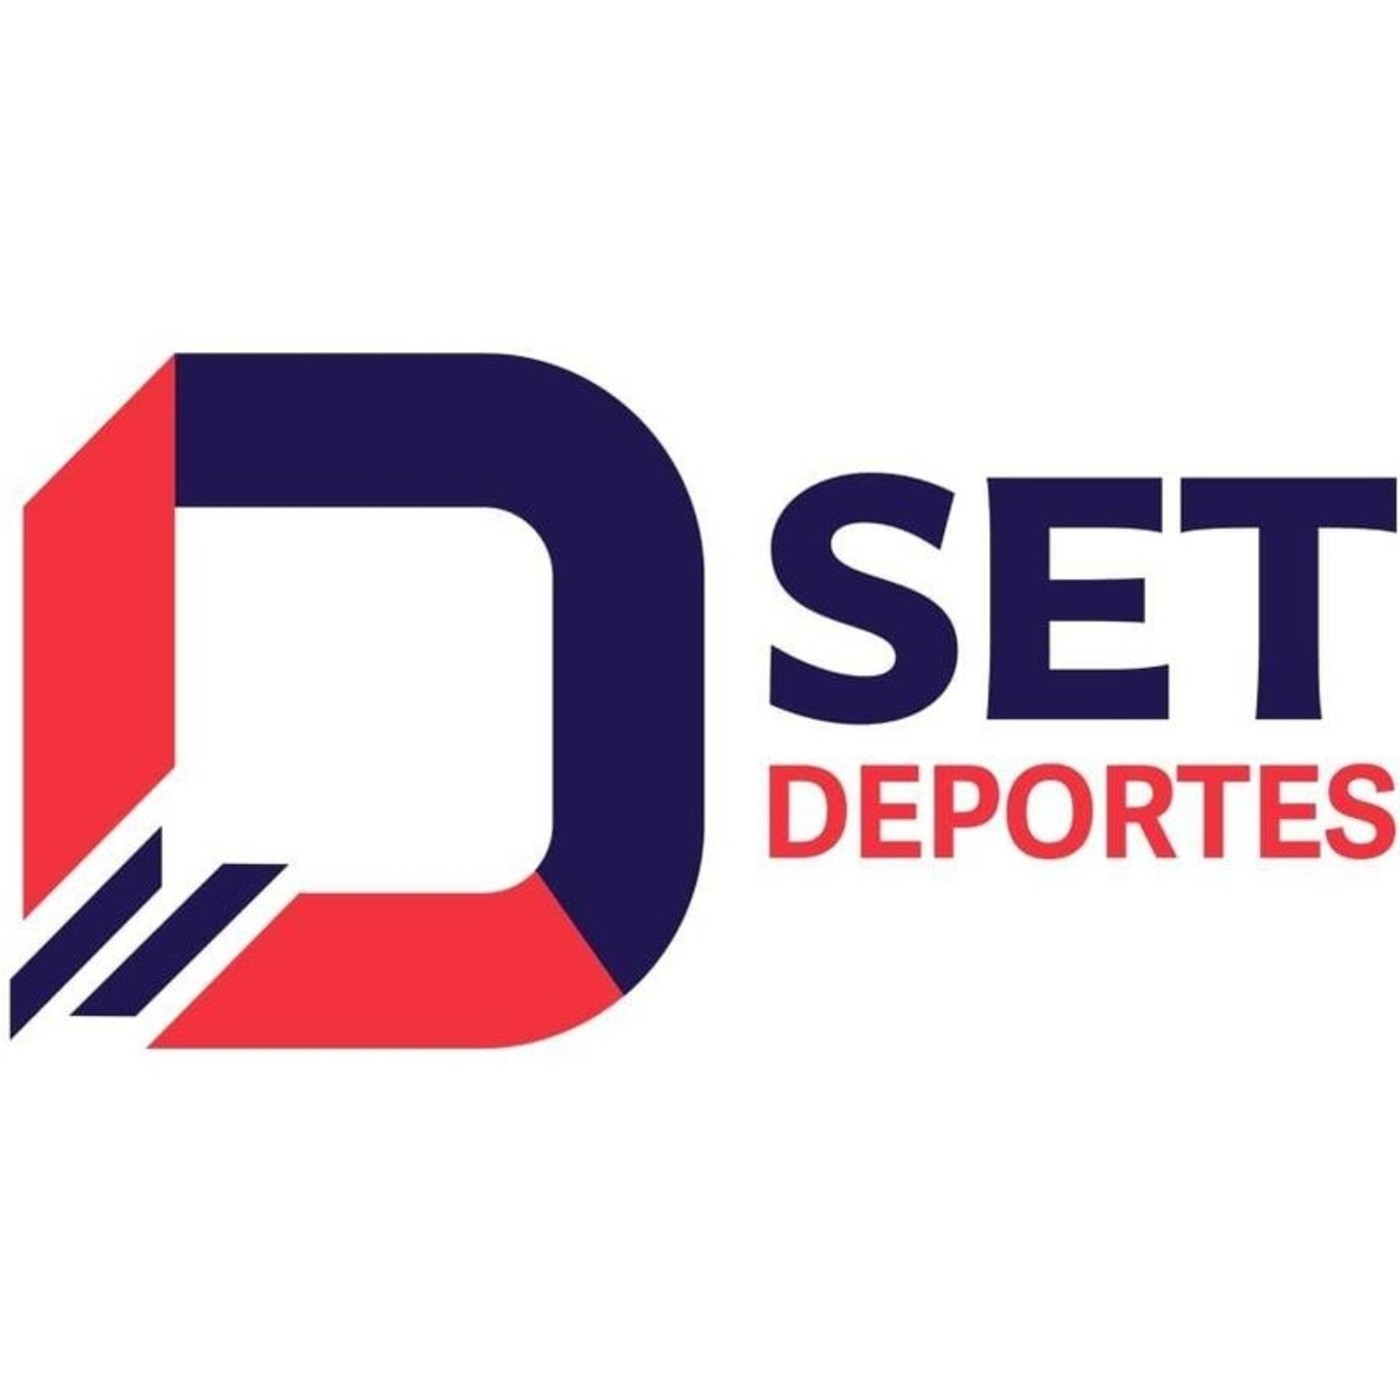 Set deportes 02 octubre 2020 (parte 1)